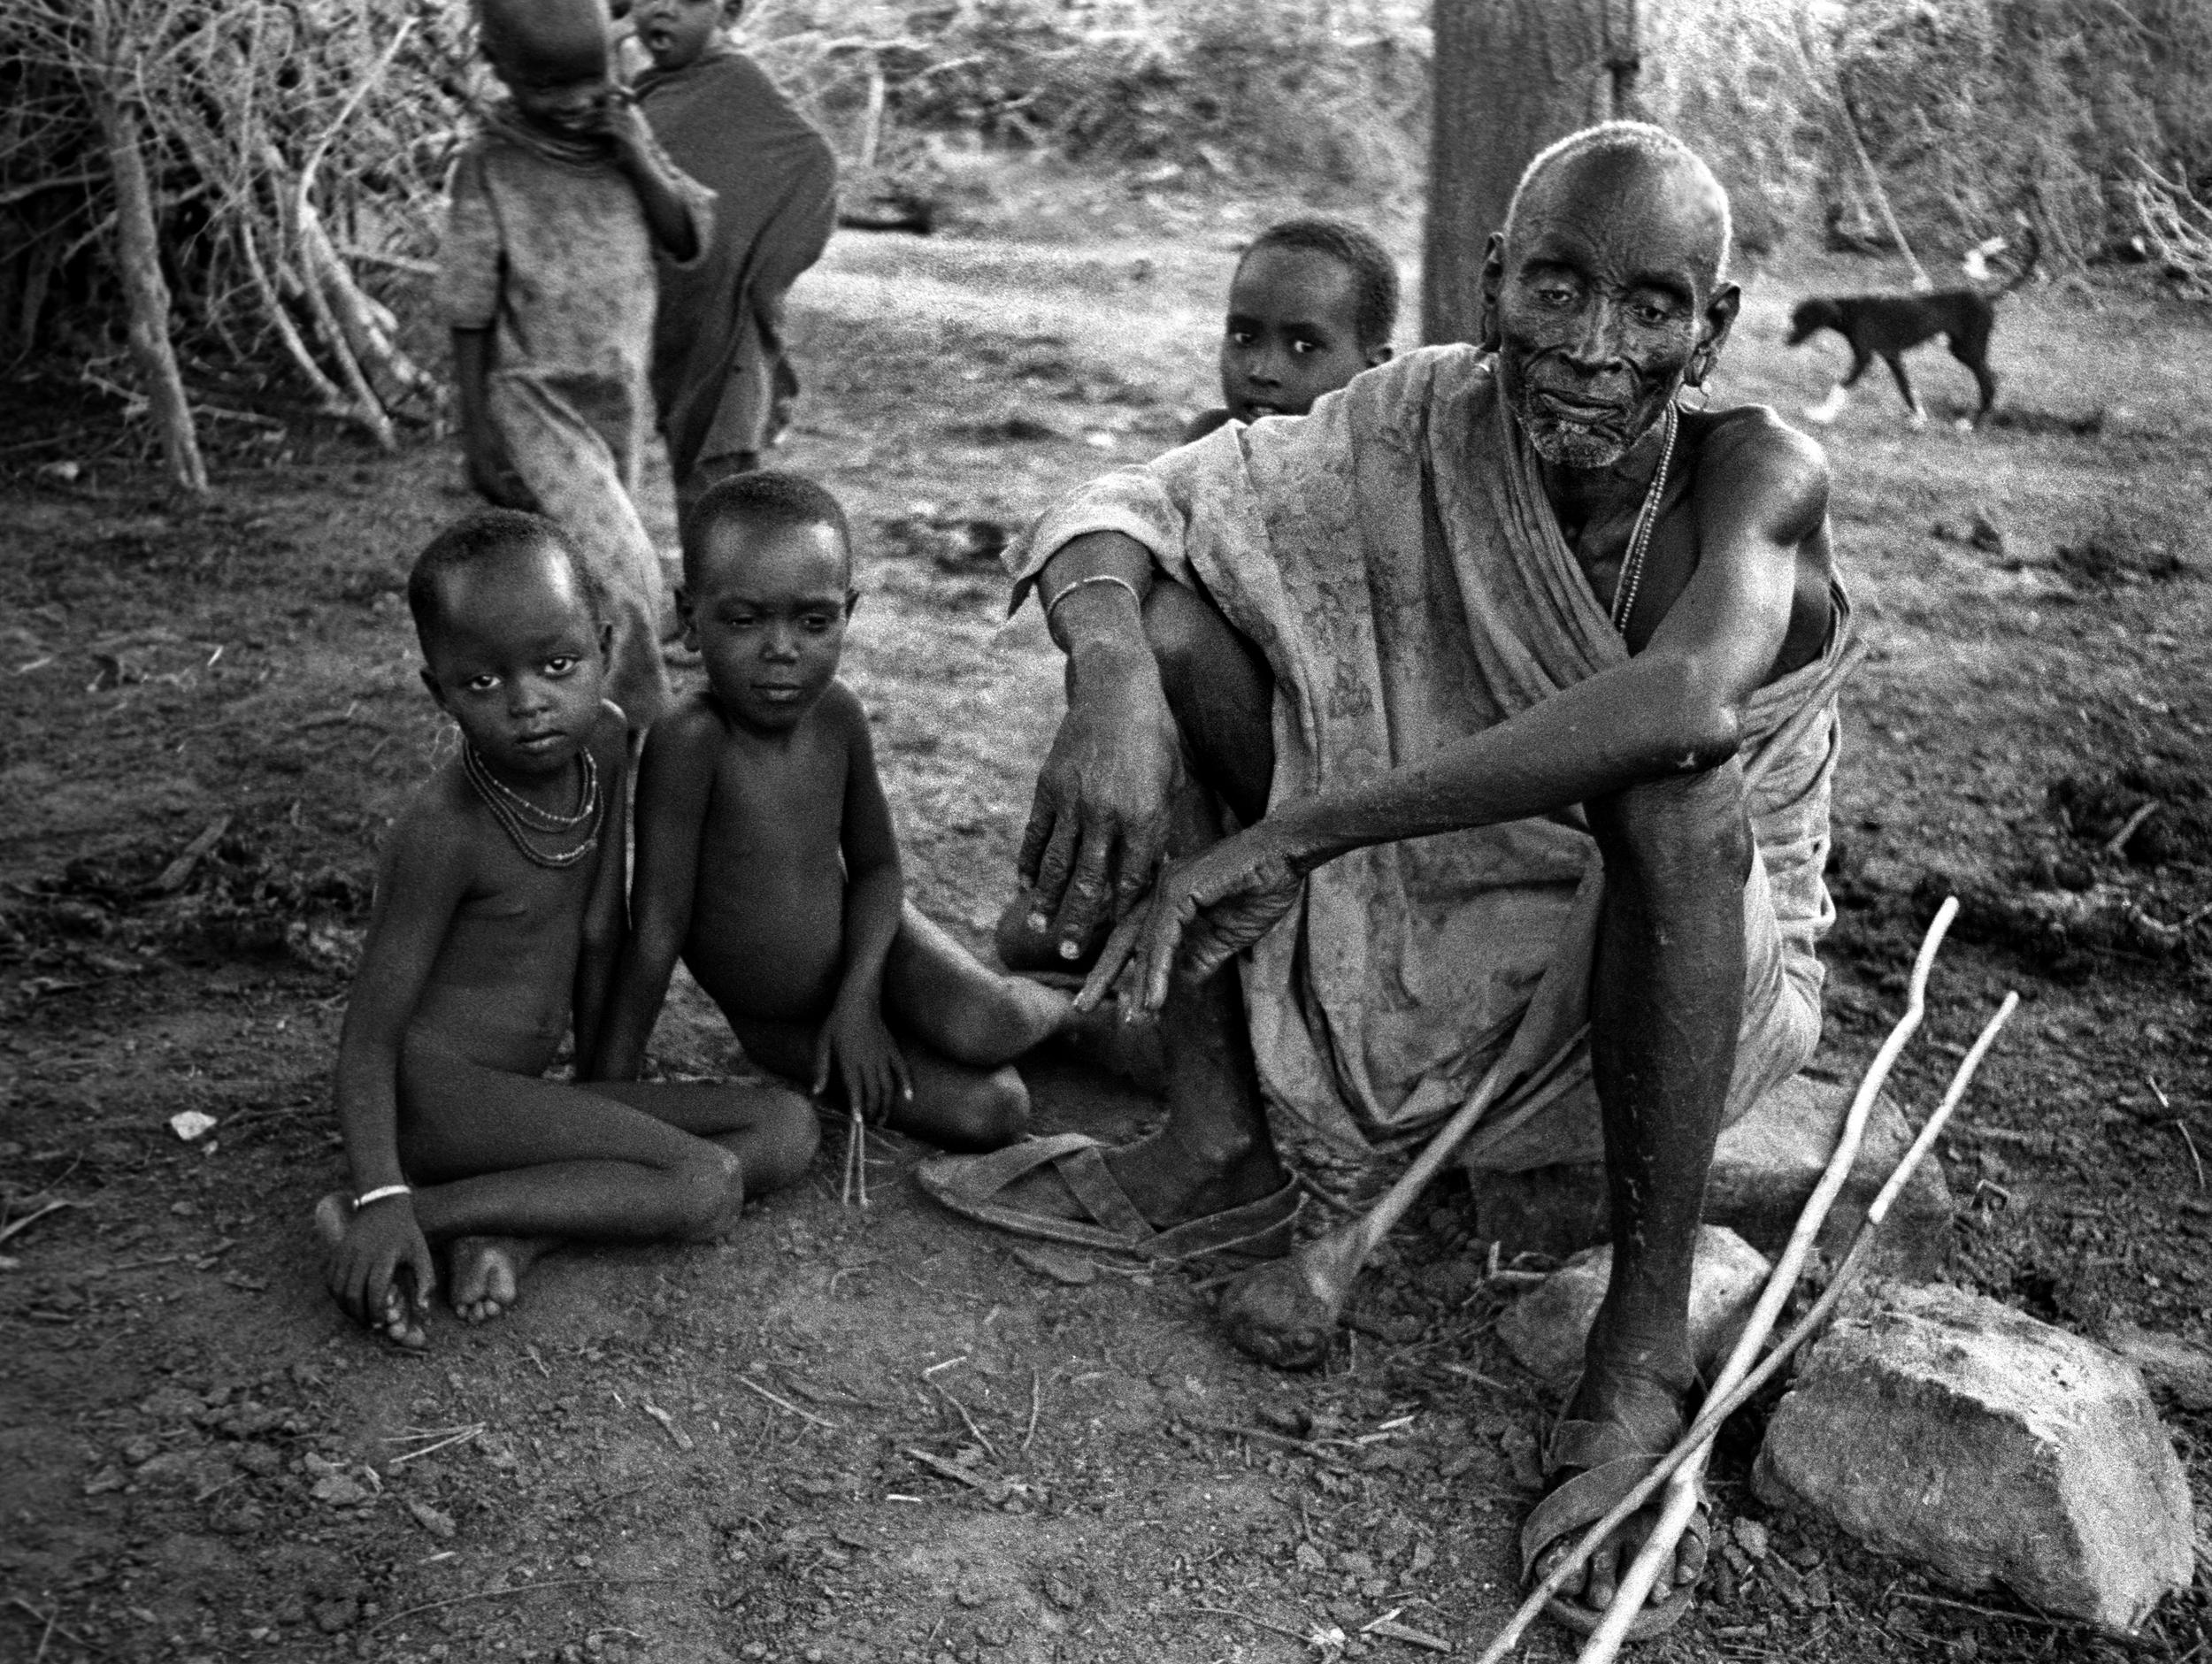 Samburu family, Marsabit, Kenya